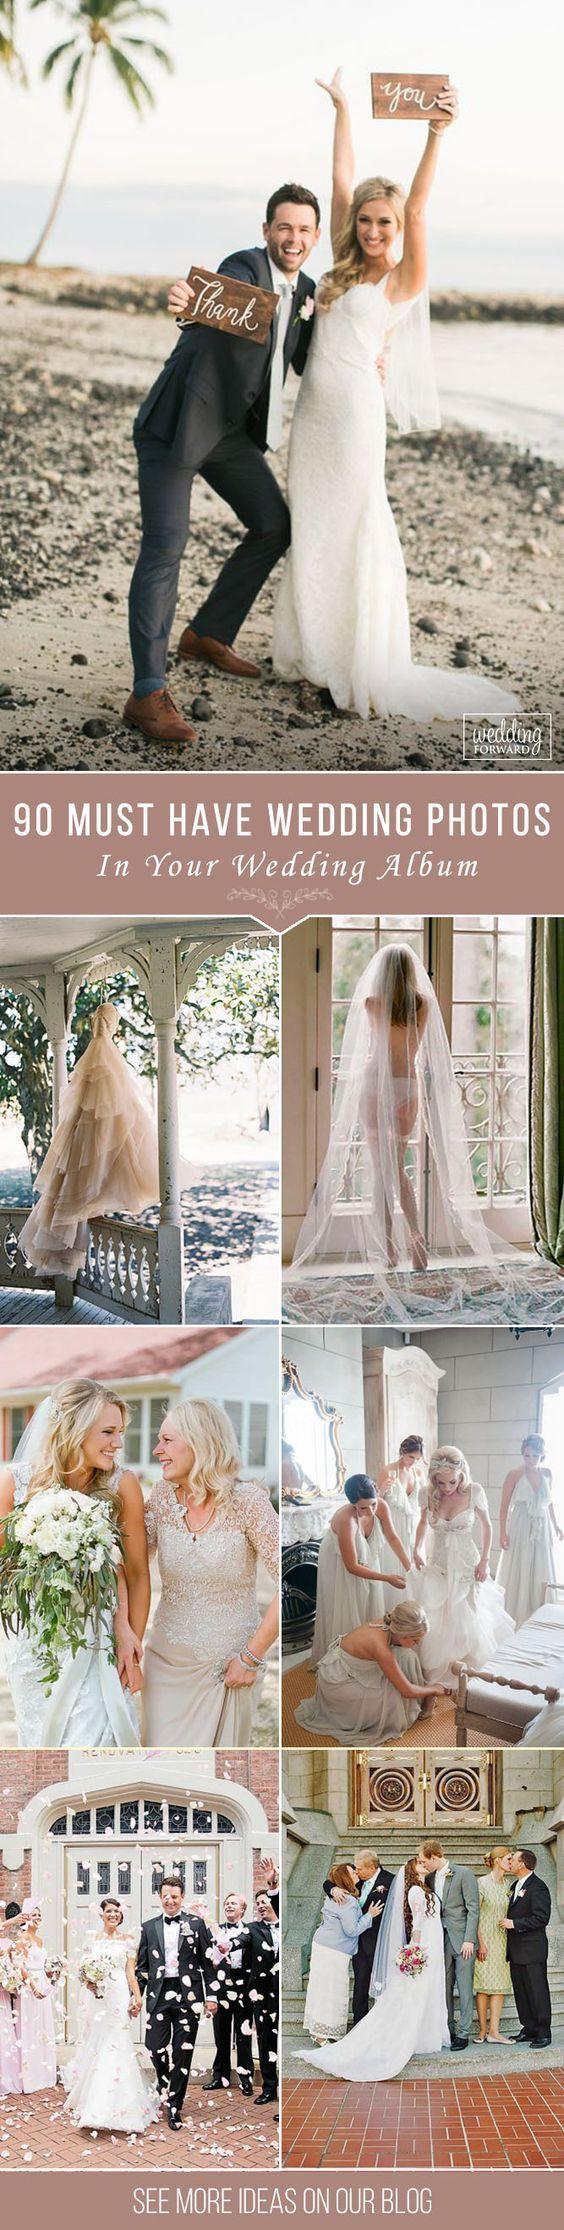 30 Great Wedding Photos Ideas For Your Album | Wedding Forward